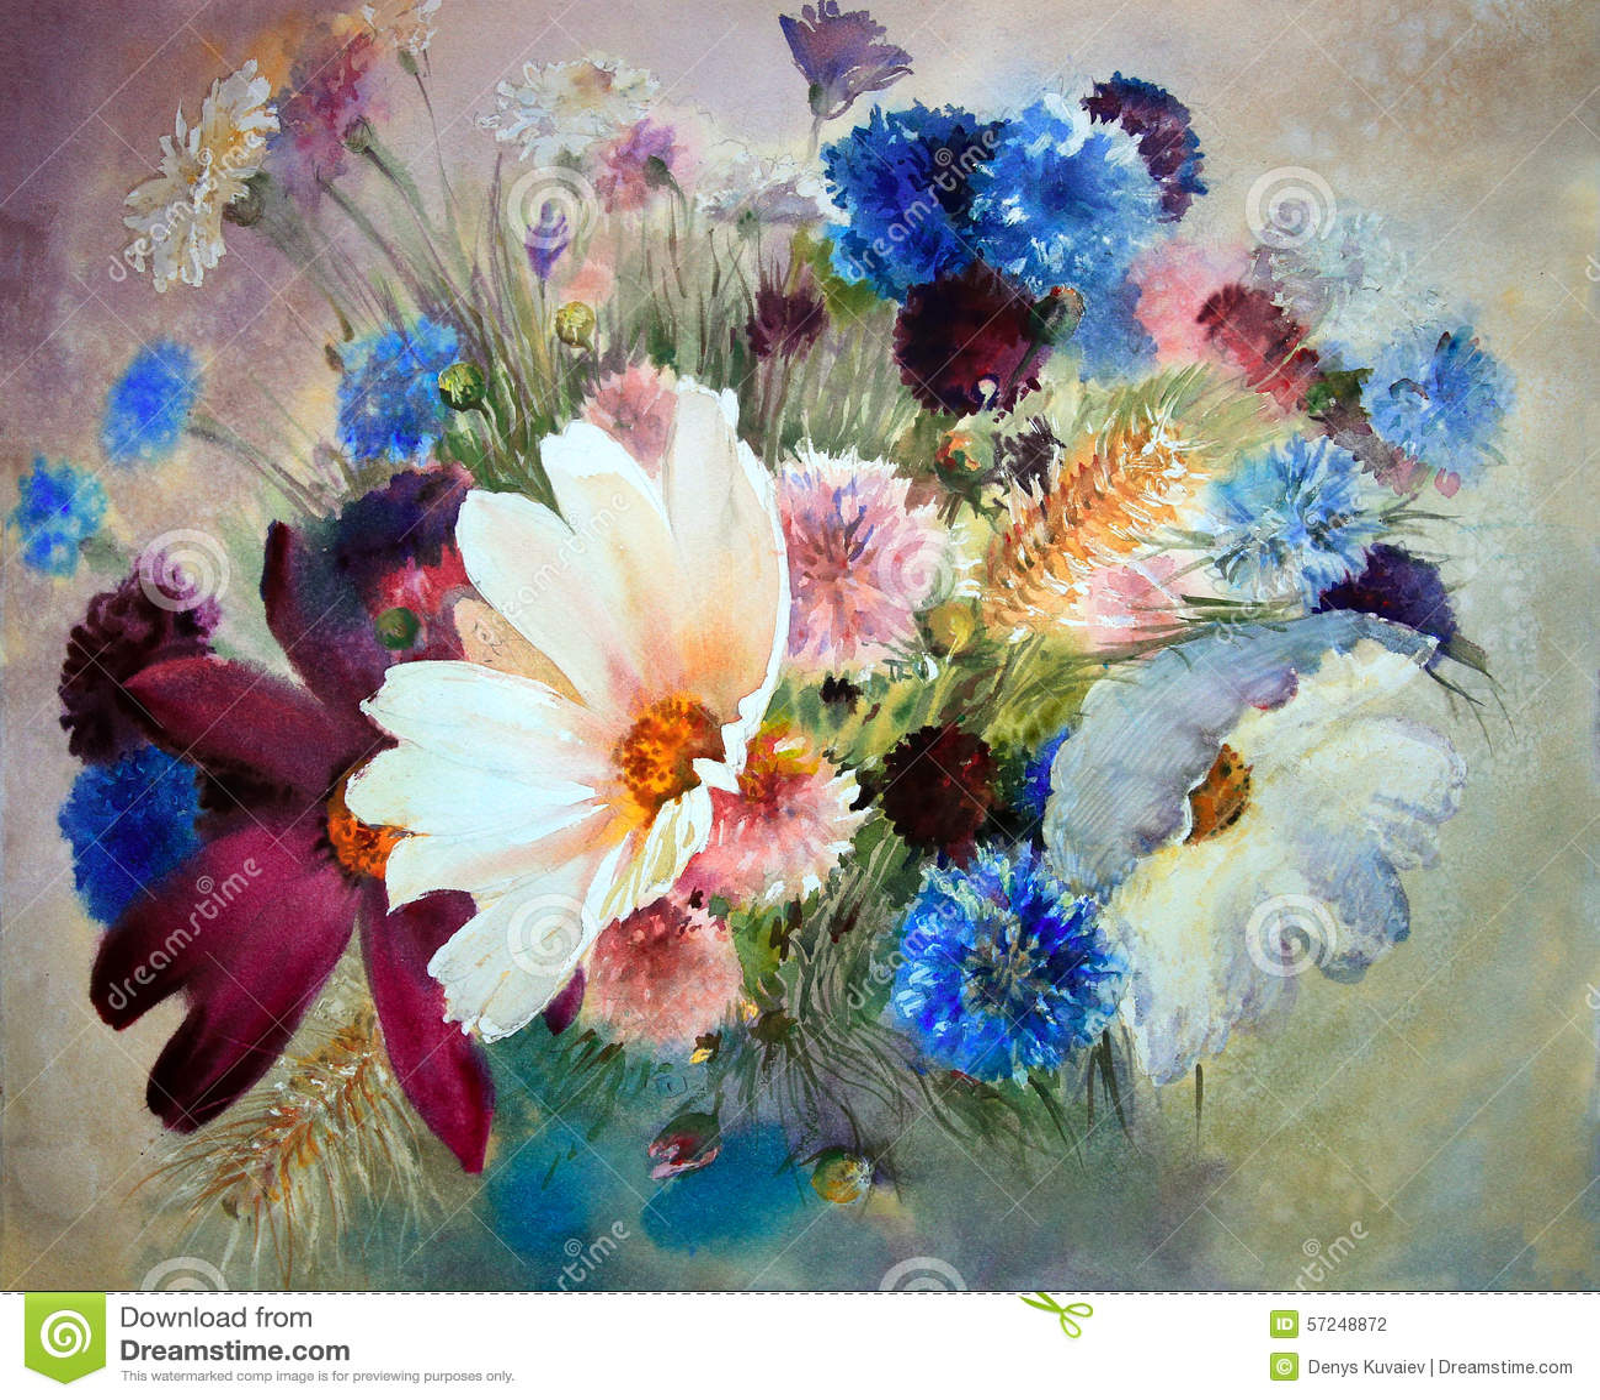 Poppy flower field watercolor painting stock illustration watercolor painting of beautiful flowers stock photography izmirmasajfo